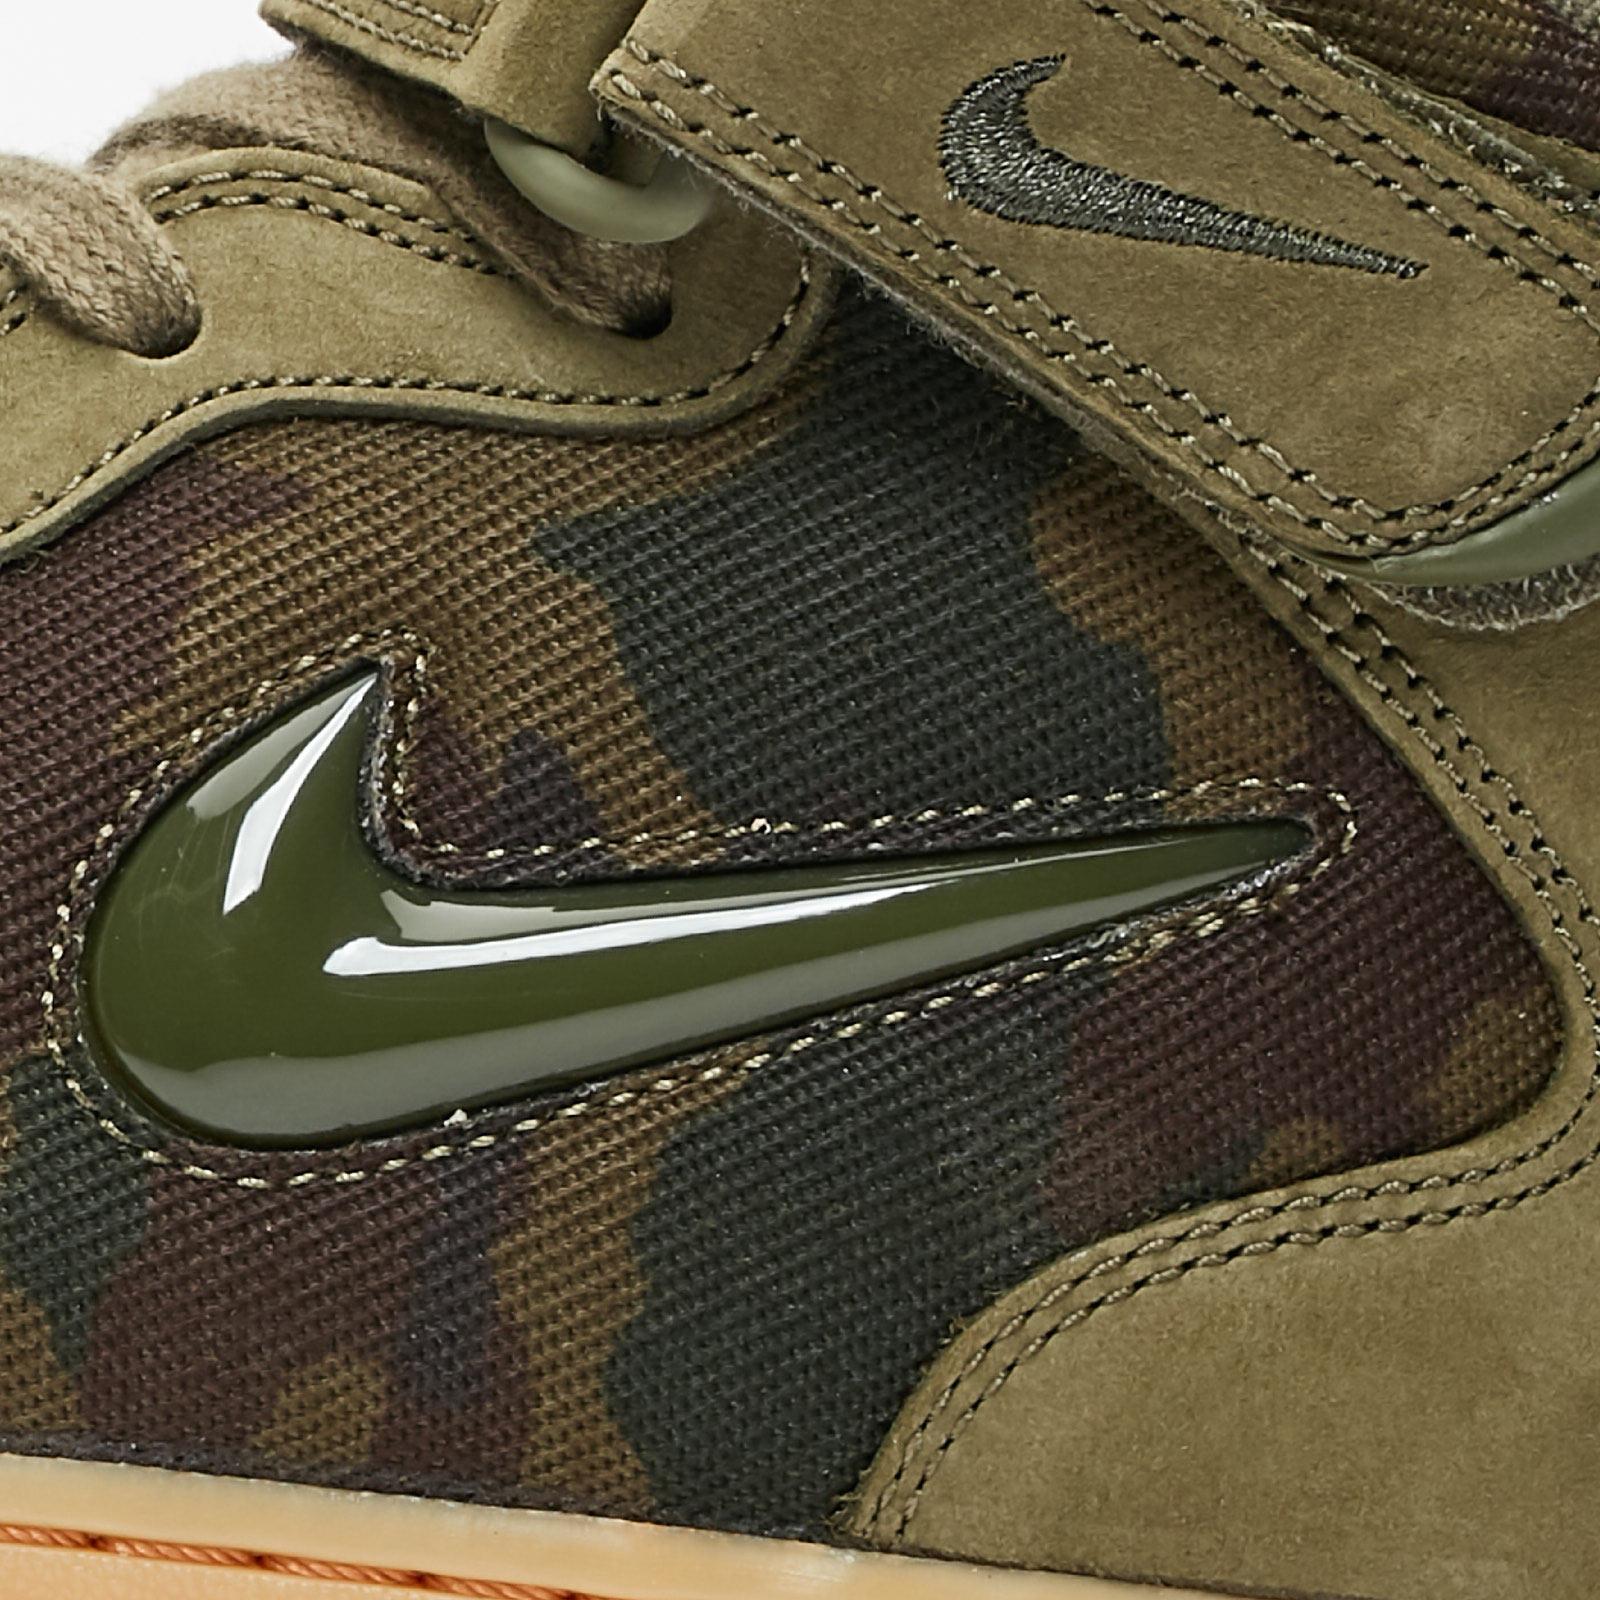 purchase cheap f25db 38a01 Nike Sportswear Air Force 1 Jewel Mid - 8. Close